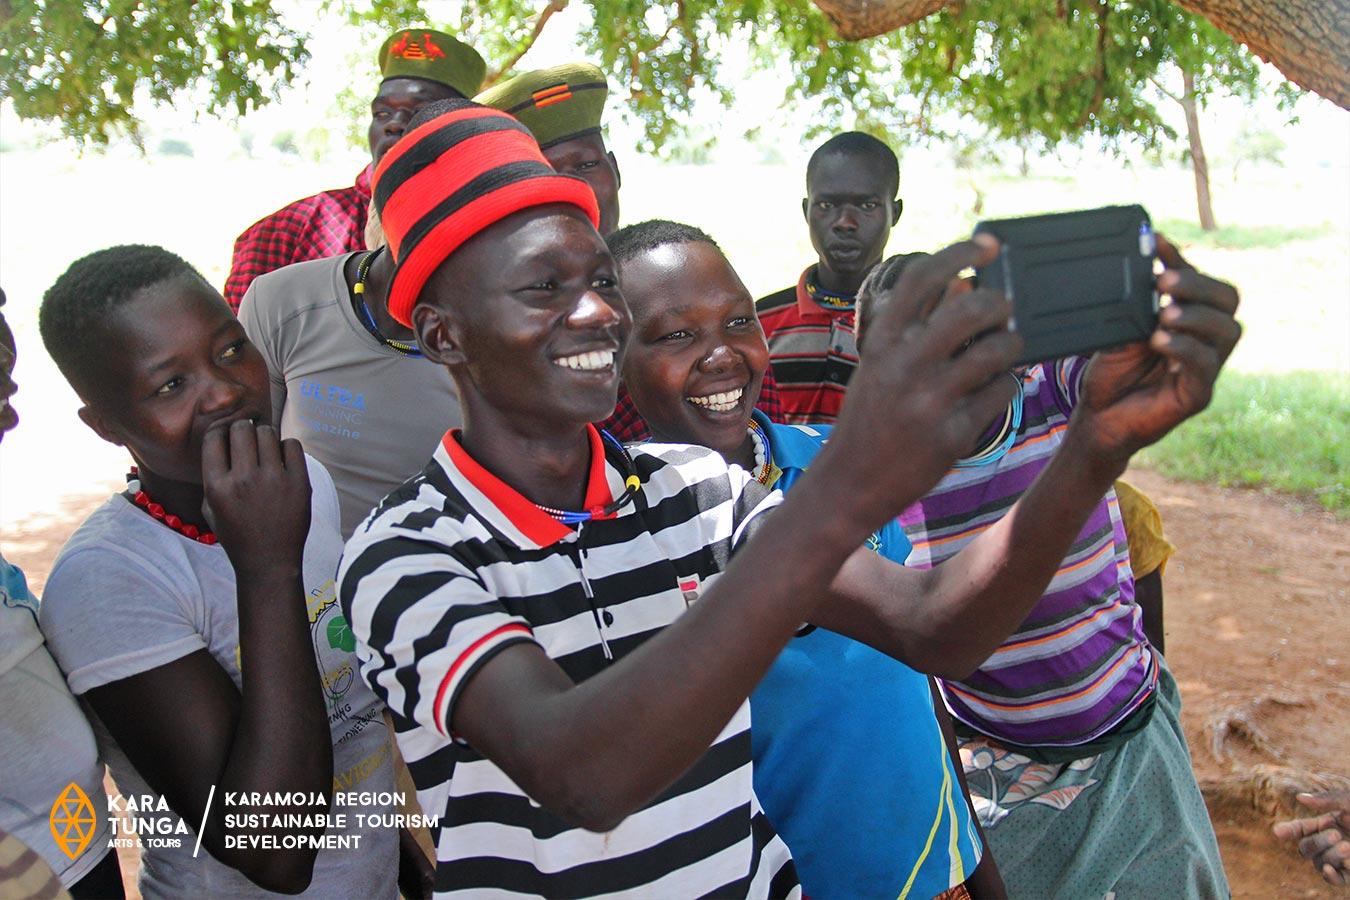 kara-tunga-karamoja-uganda-virtual-online-cultural-video-tour. 2